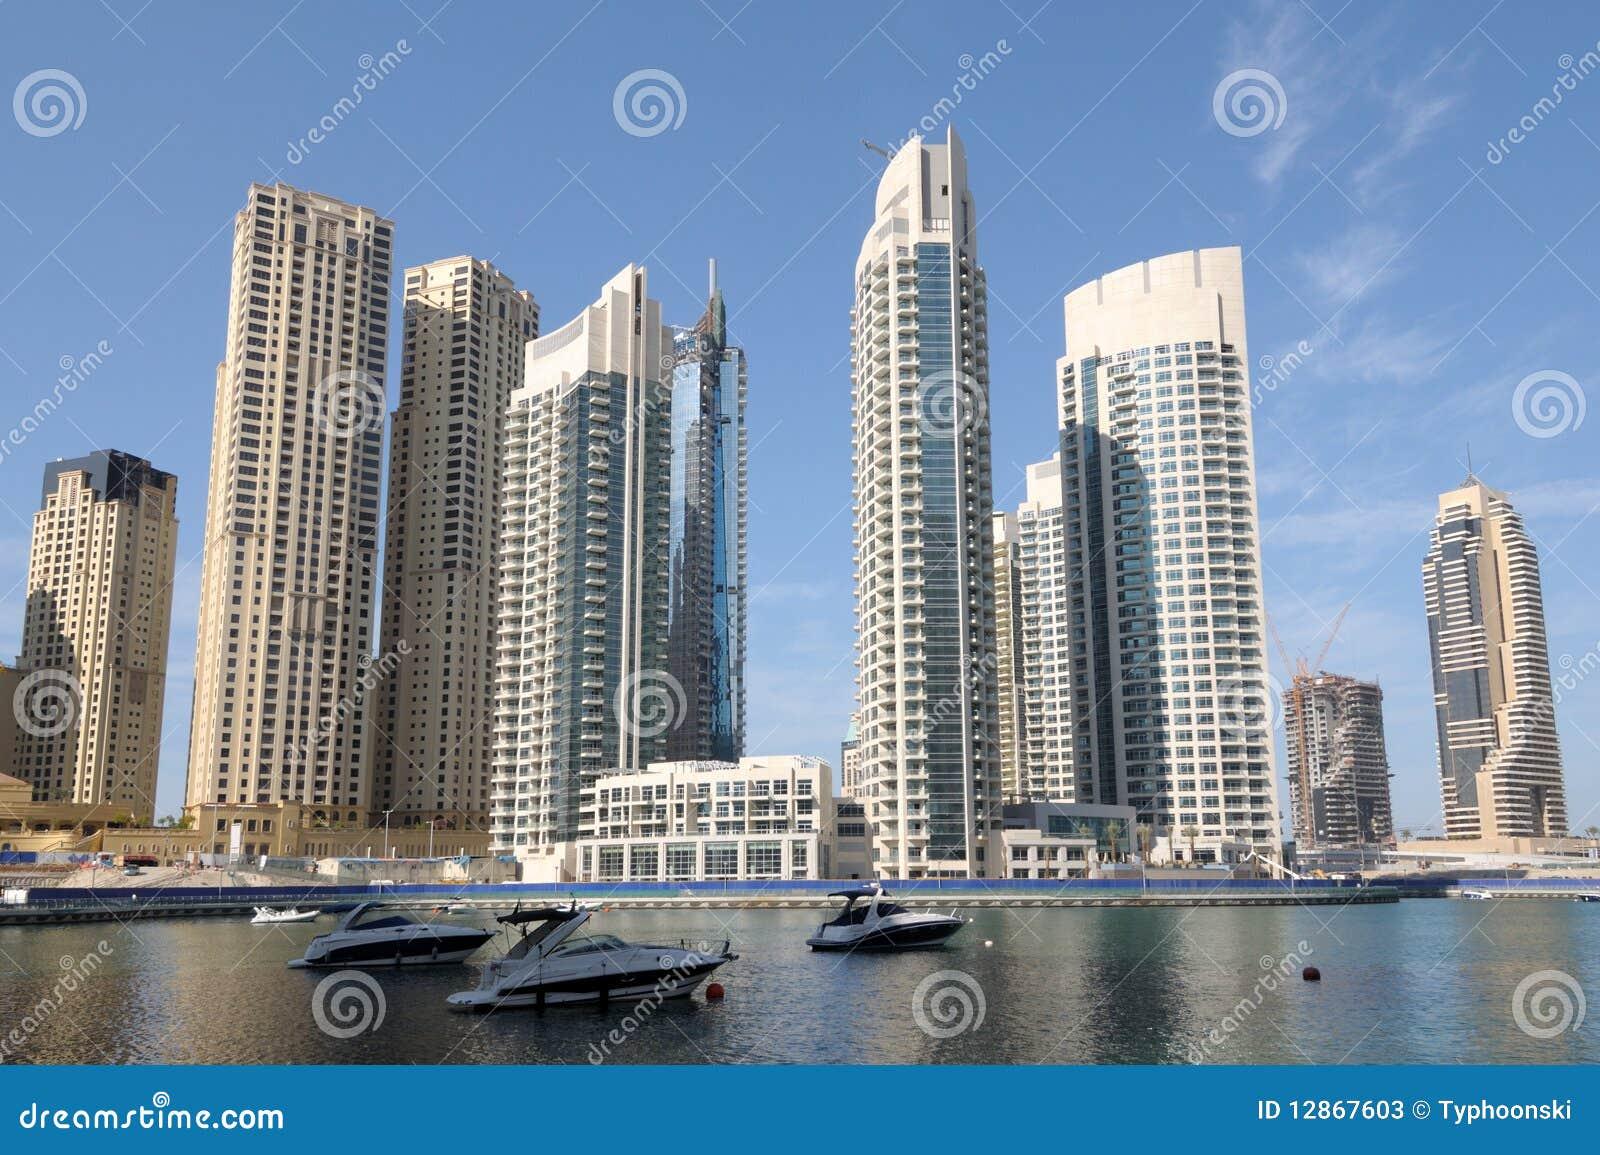 immeubles de luxe la marina de duba image stock image du neuf urbain 12867603. Black Bedroom Furniture Sets. Home Design Ideas